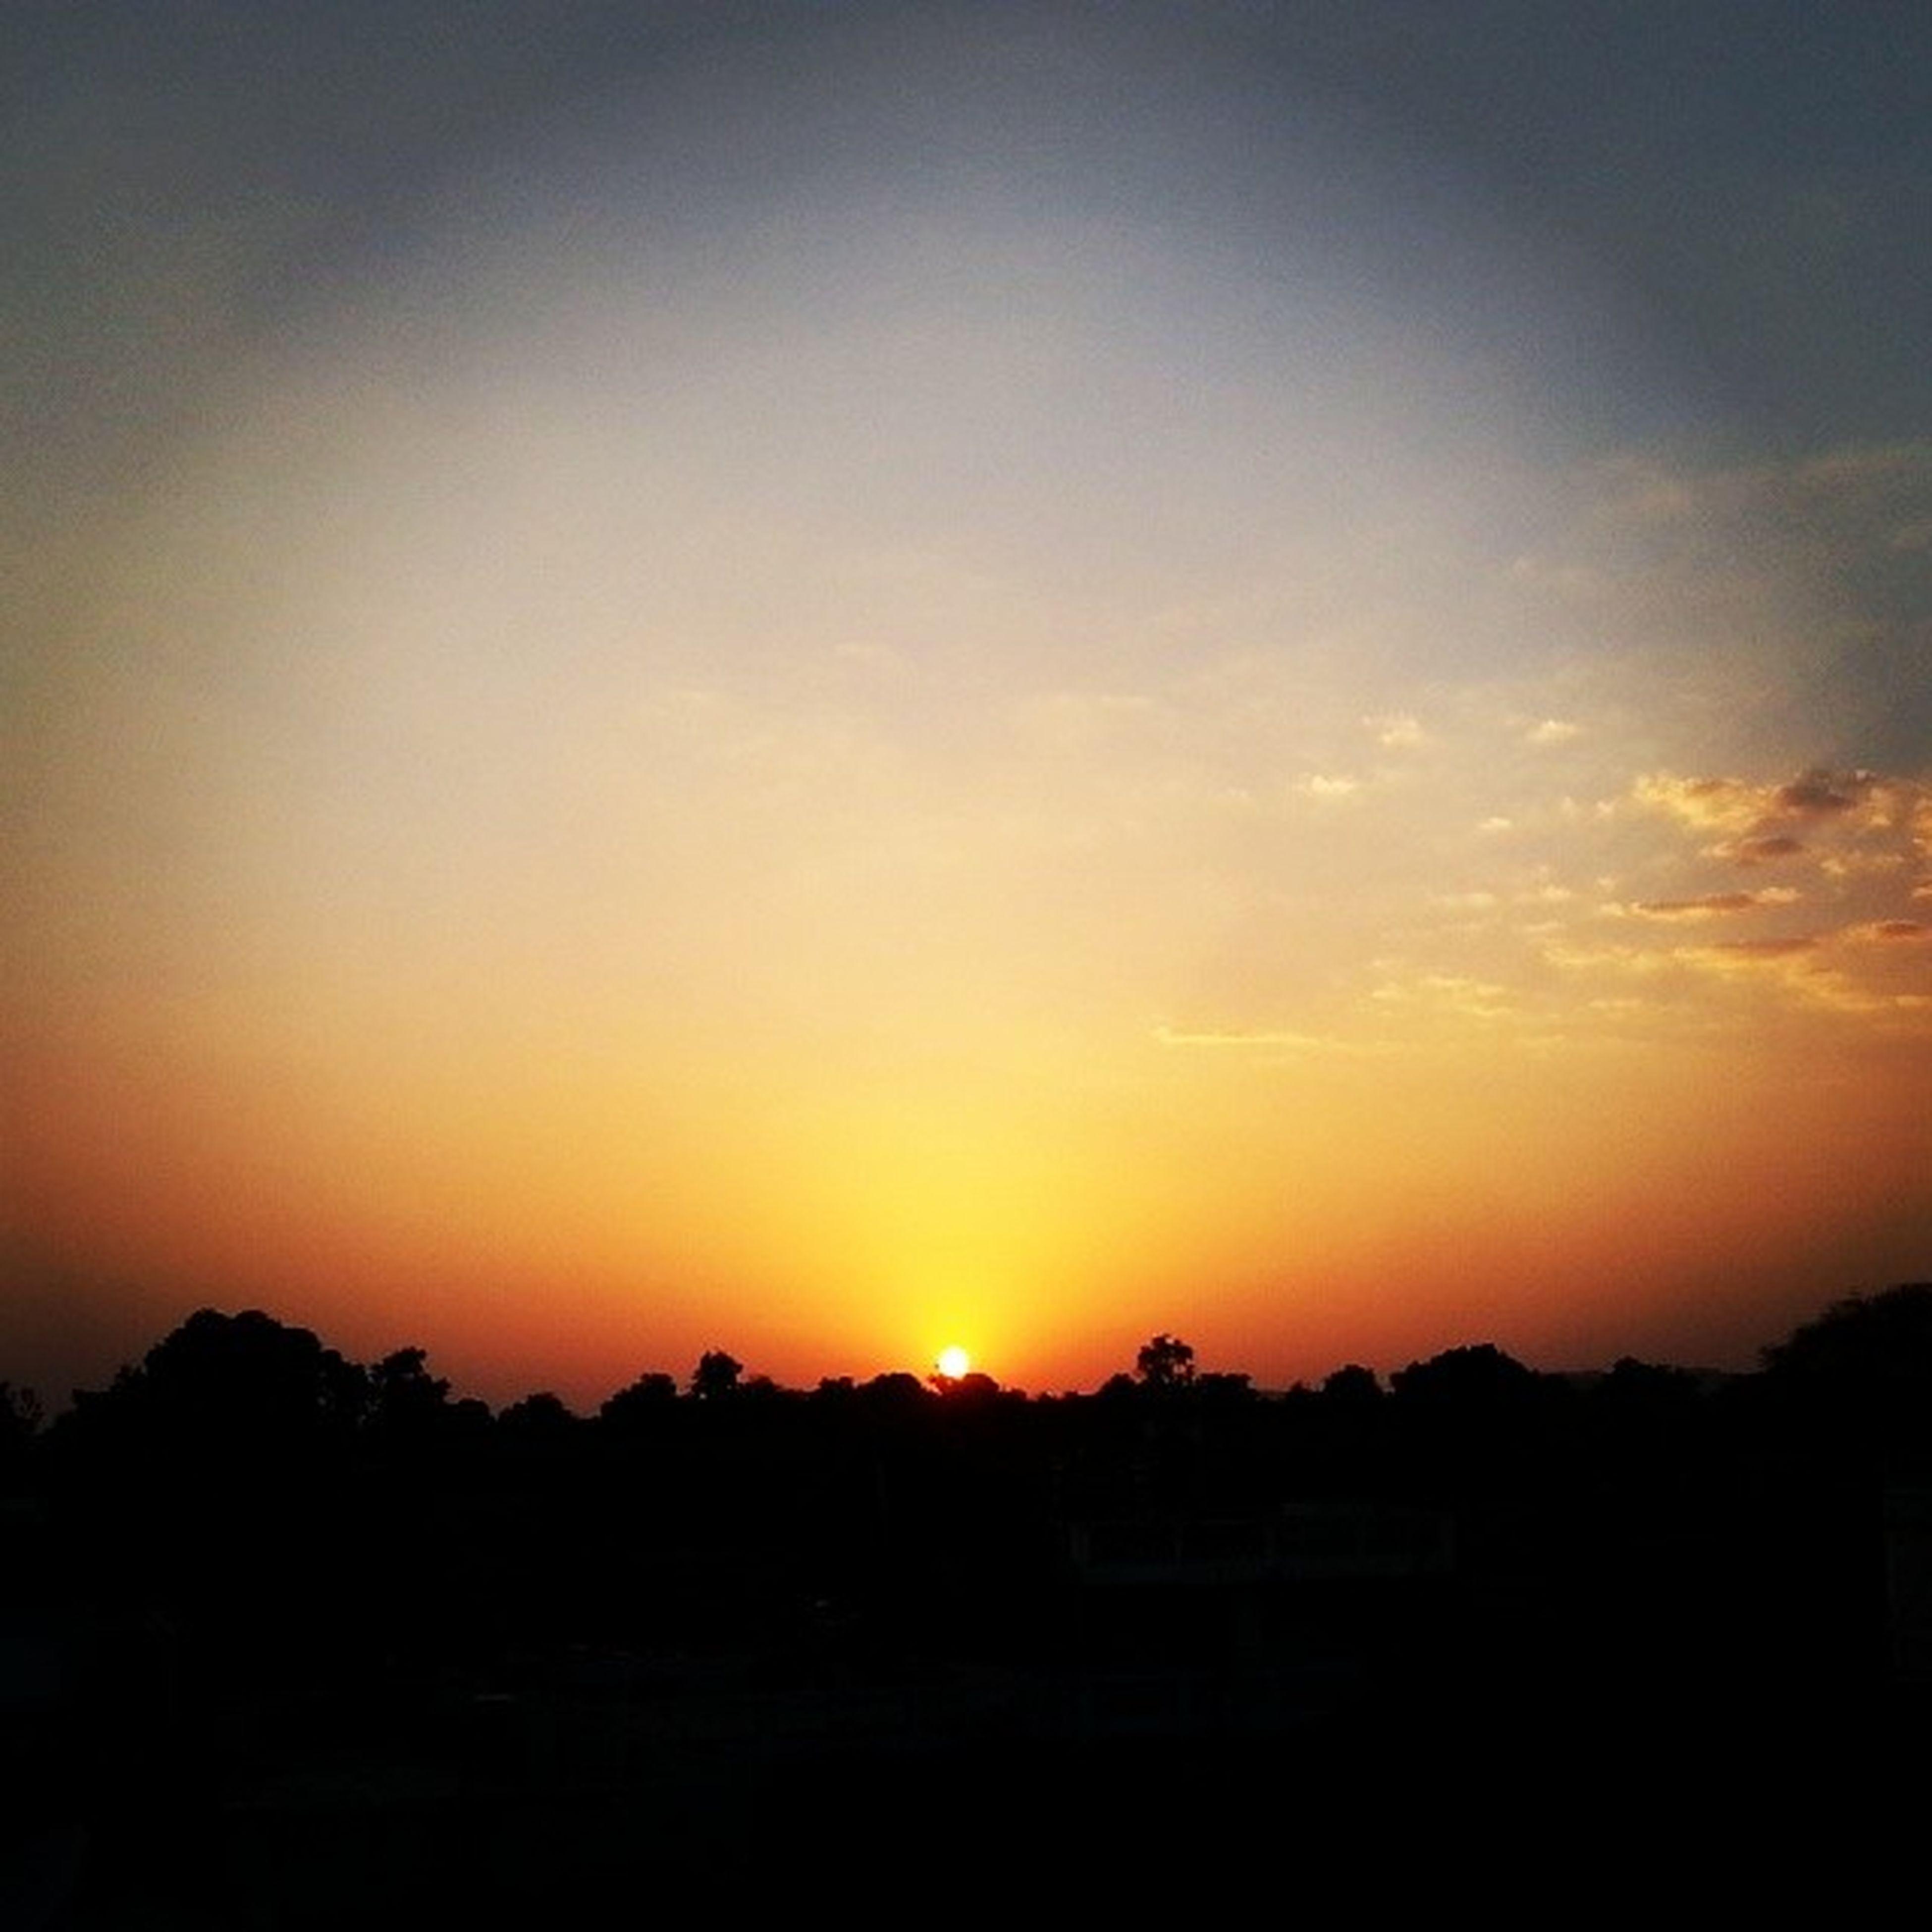 sunset, silhouette, sun, orange color, scenics, tranquil scene, beauty in nature, tranquility, sky, idyllic, nature, landscape, copy space, sunlight, outdoors, no people, dark, sunbeam, tree, majestic